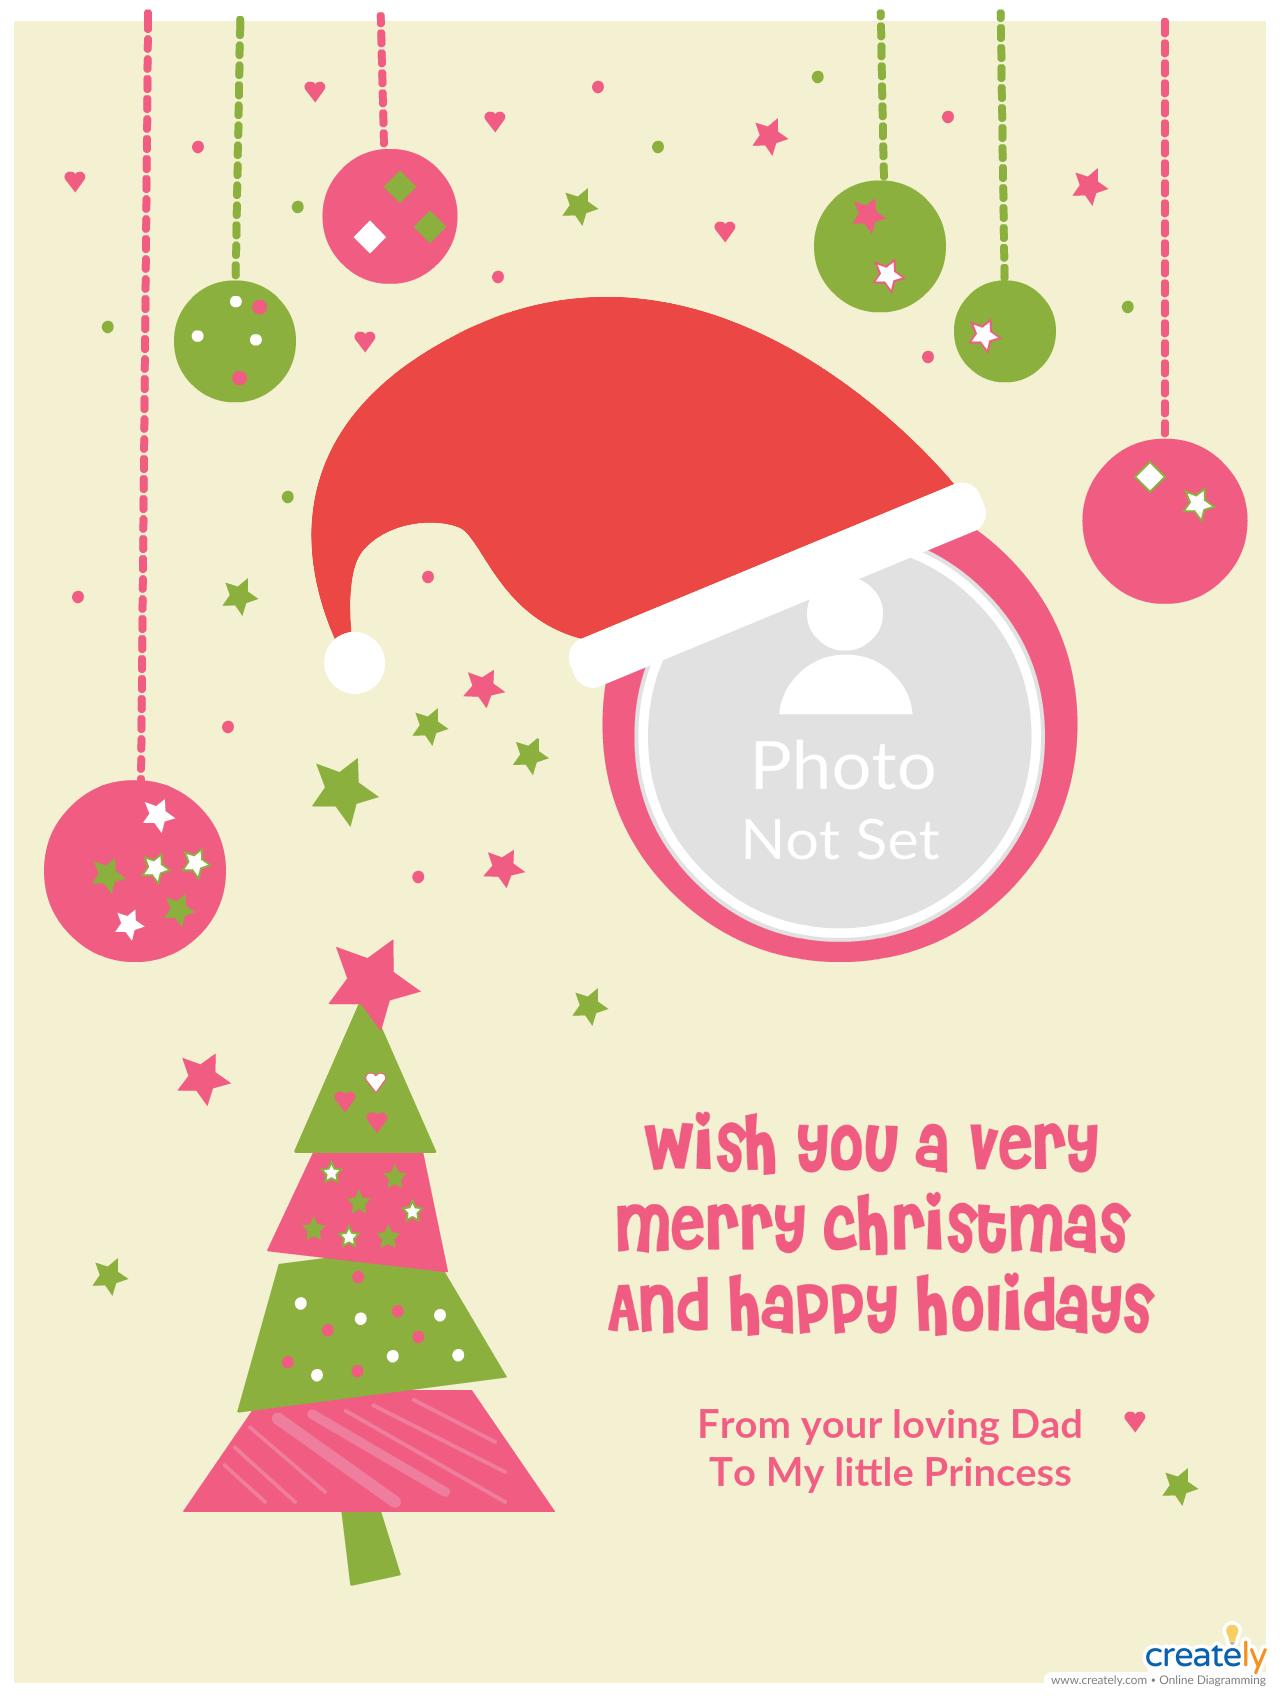 Christmas Greeting Cards Online Xmas Greeting Cards Christmas Greeting Cards Online Greeting Cards